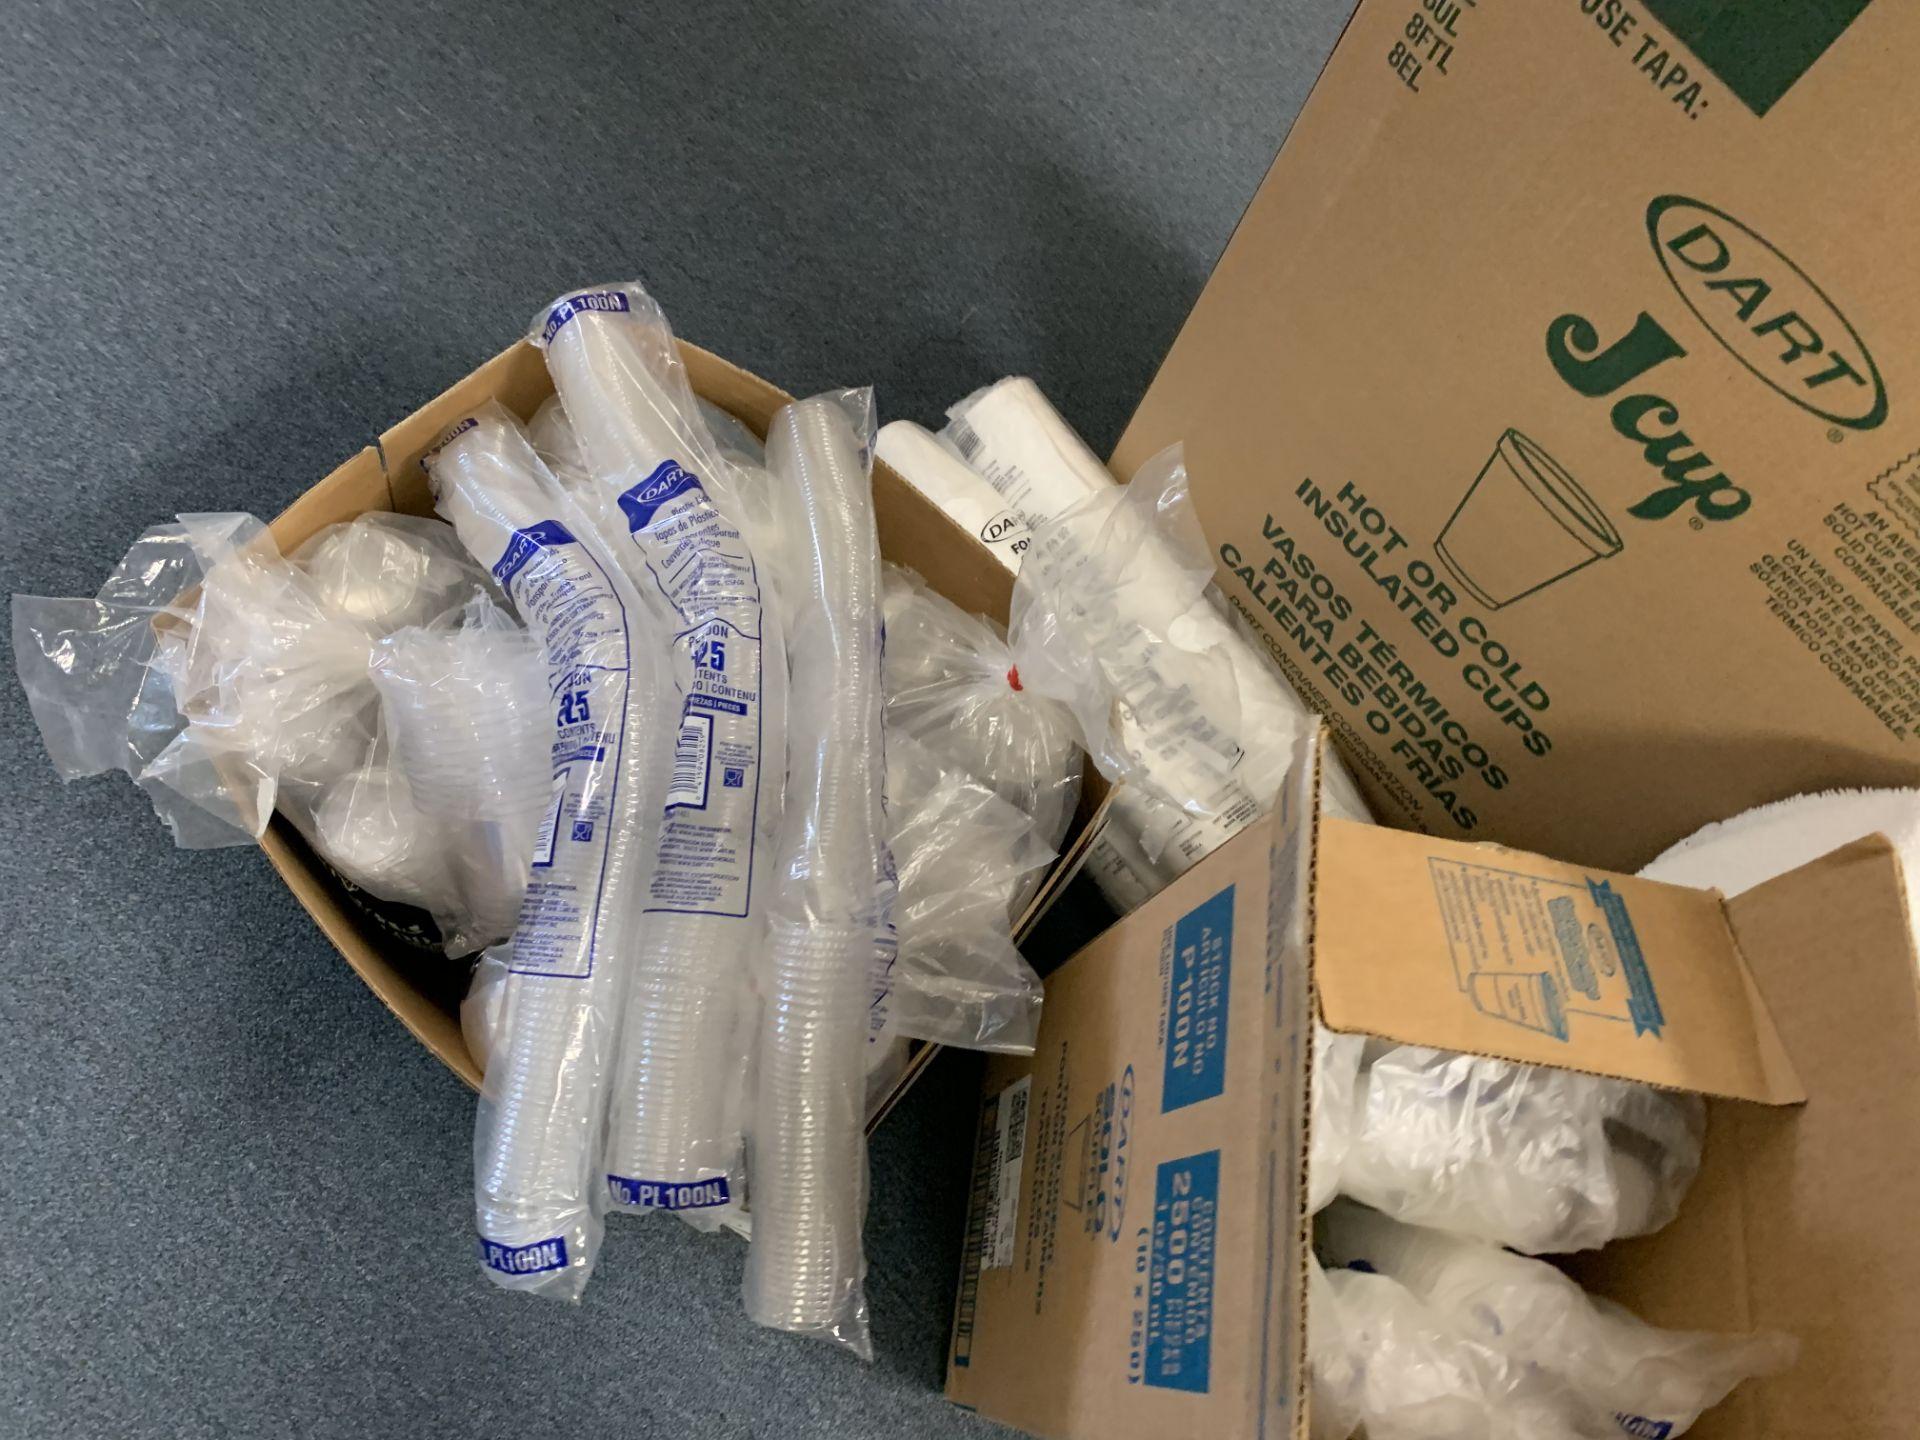 Lot 354 - LOT ASSORTED PLASTIC, STYROFOAM, CUPS, ETC